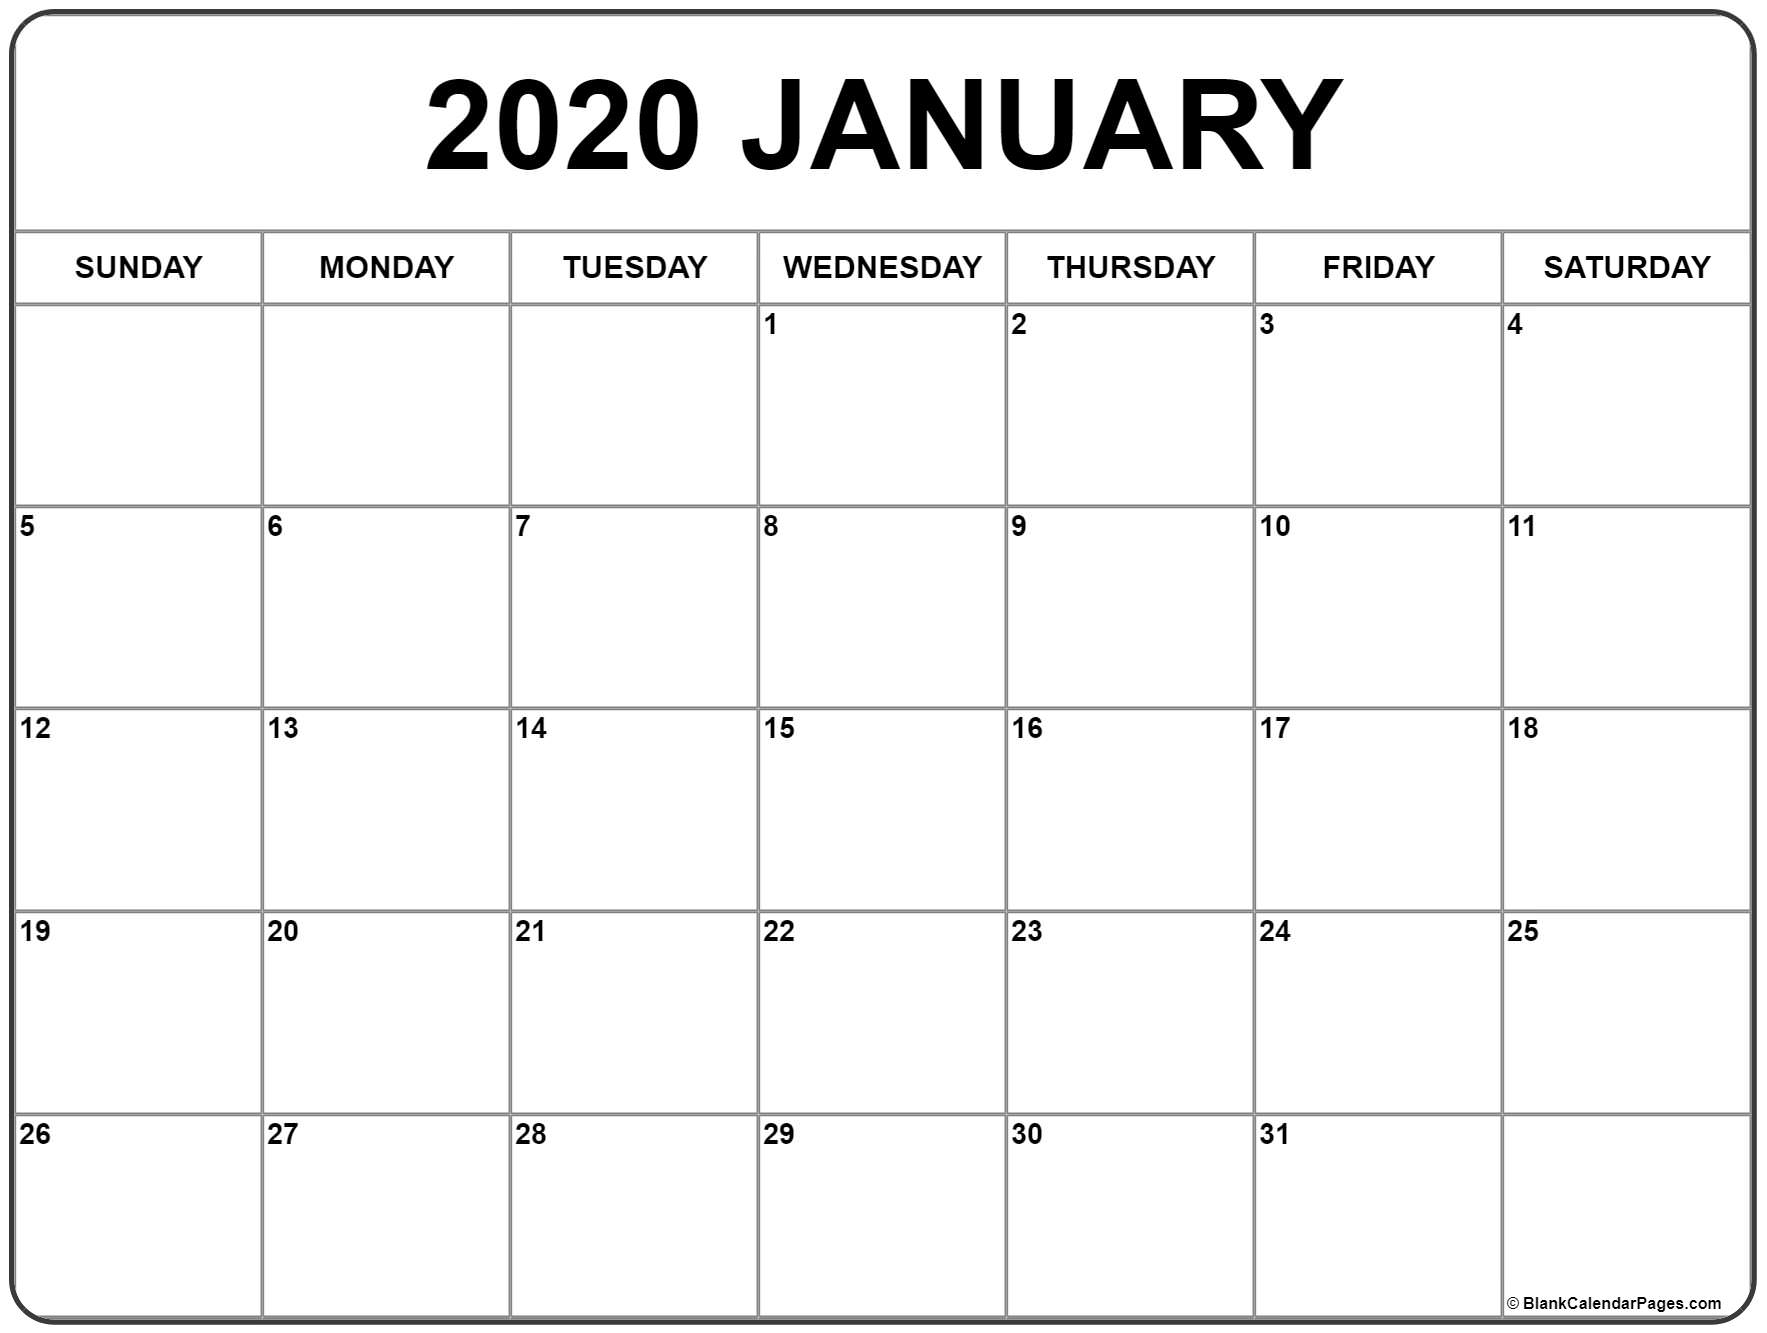 January 2020 Calendar | Free Printable Monthly Calendars with regard to Free Printable 2020 Calendar With Space To Write